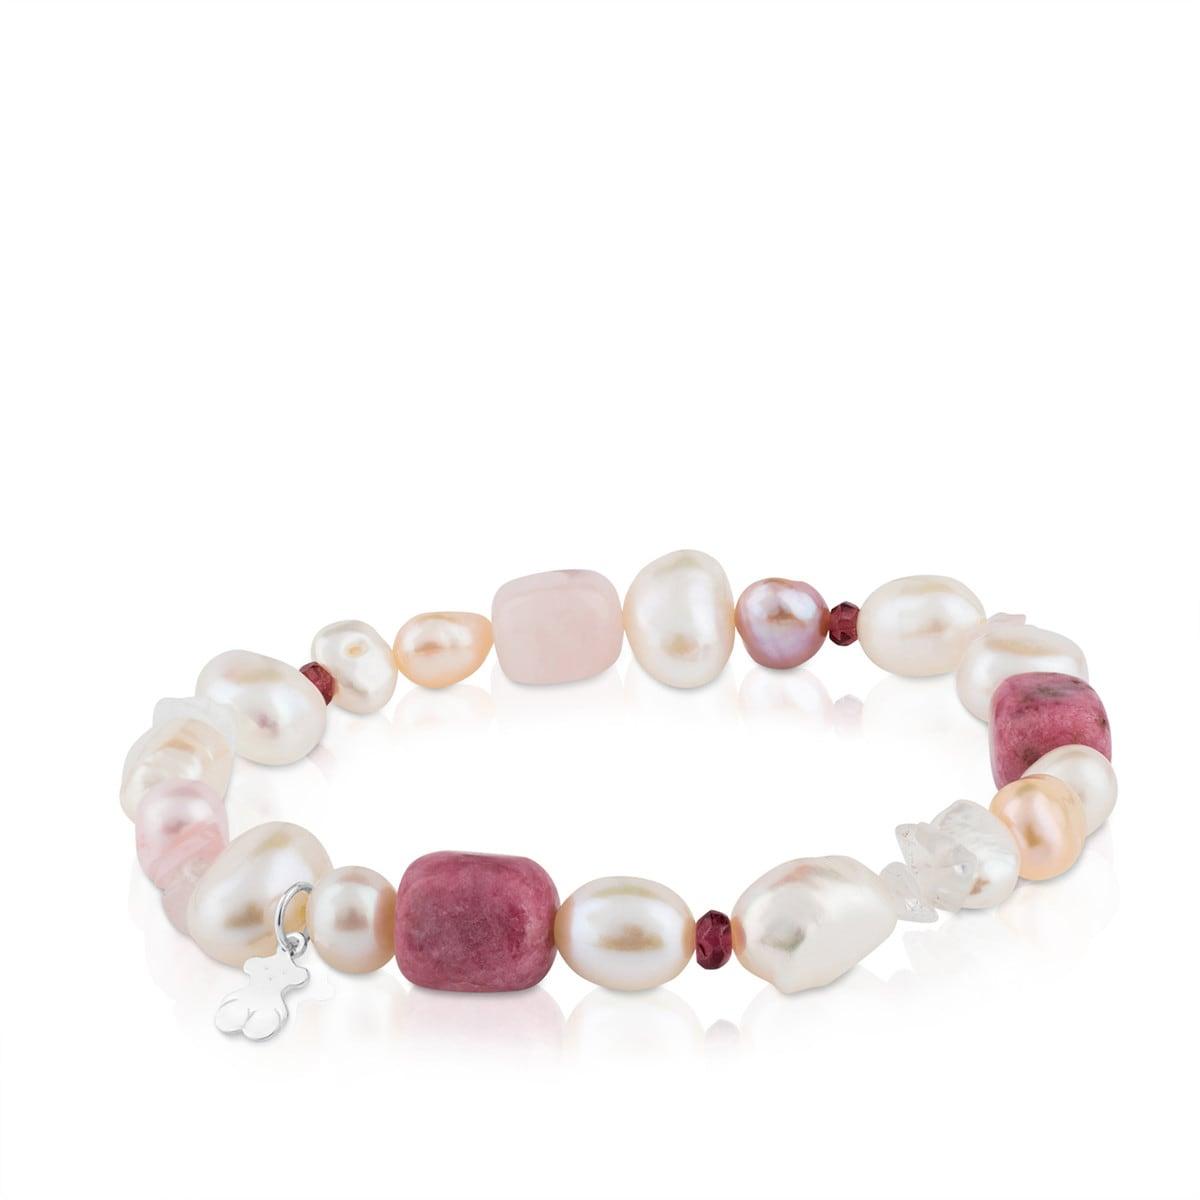 Pulseira TOUS Pearls em Prata